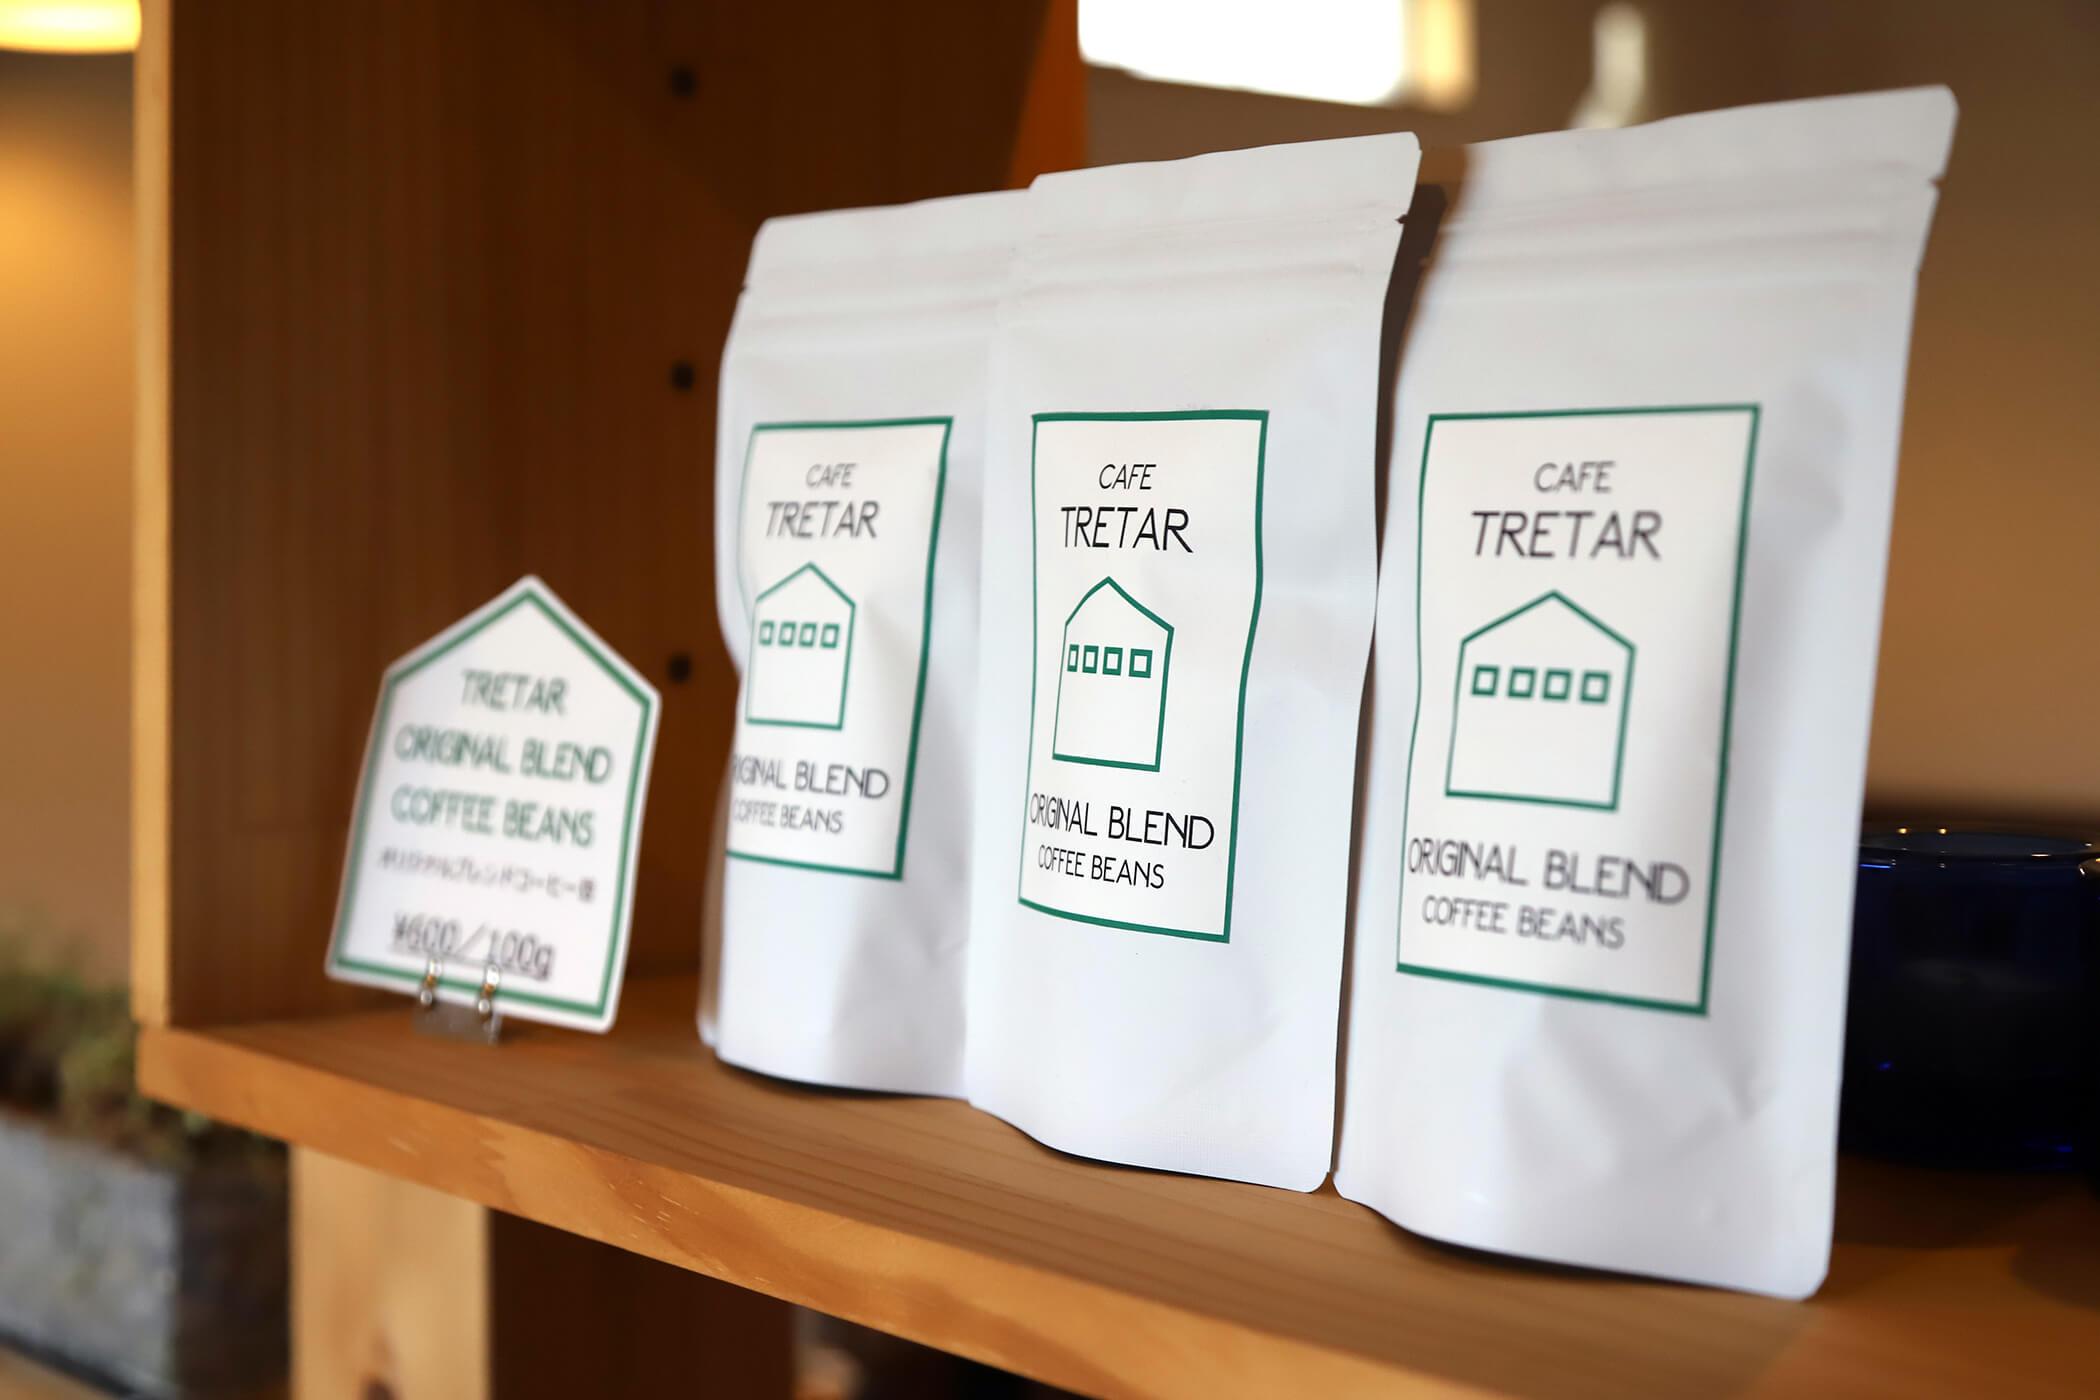 CAFE TRETAR 写真14